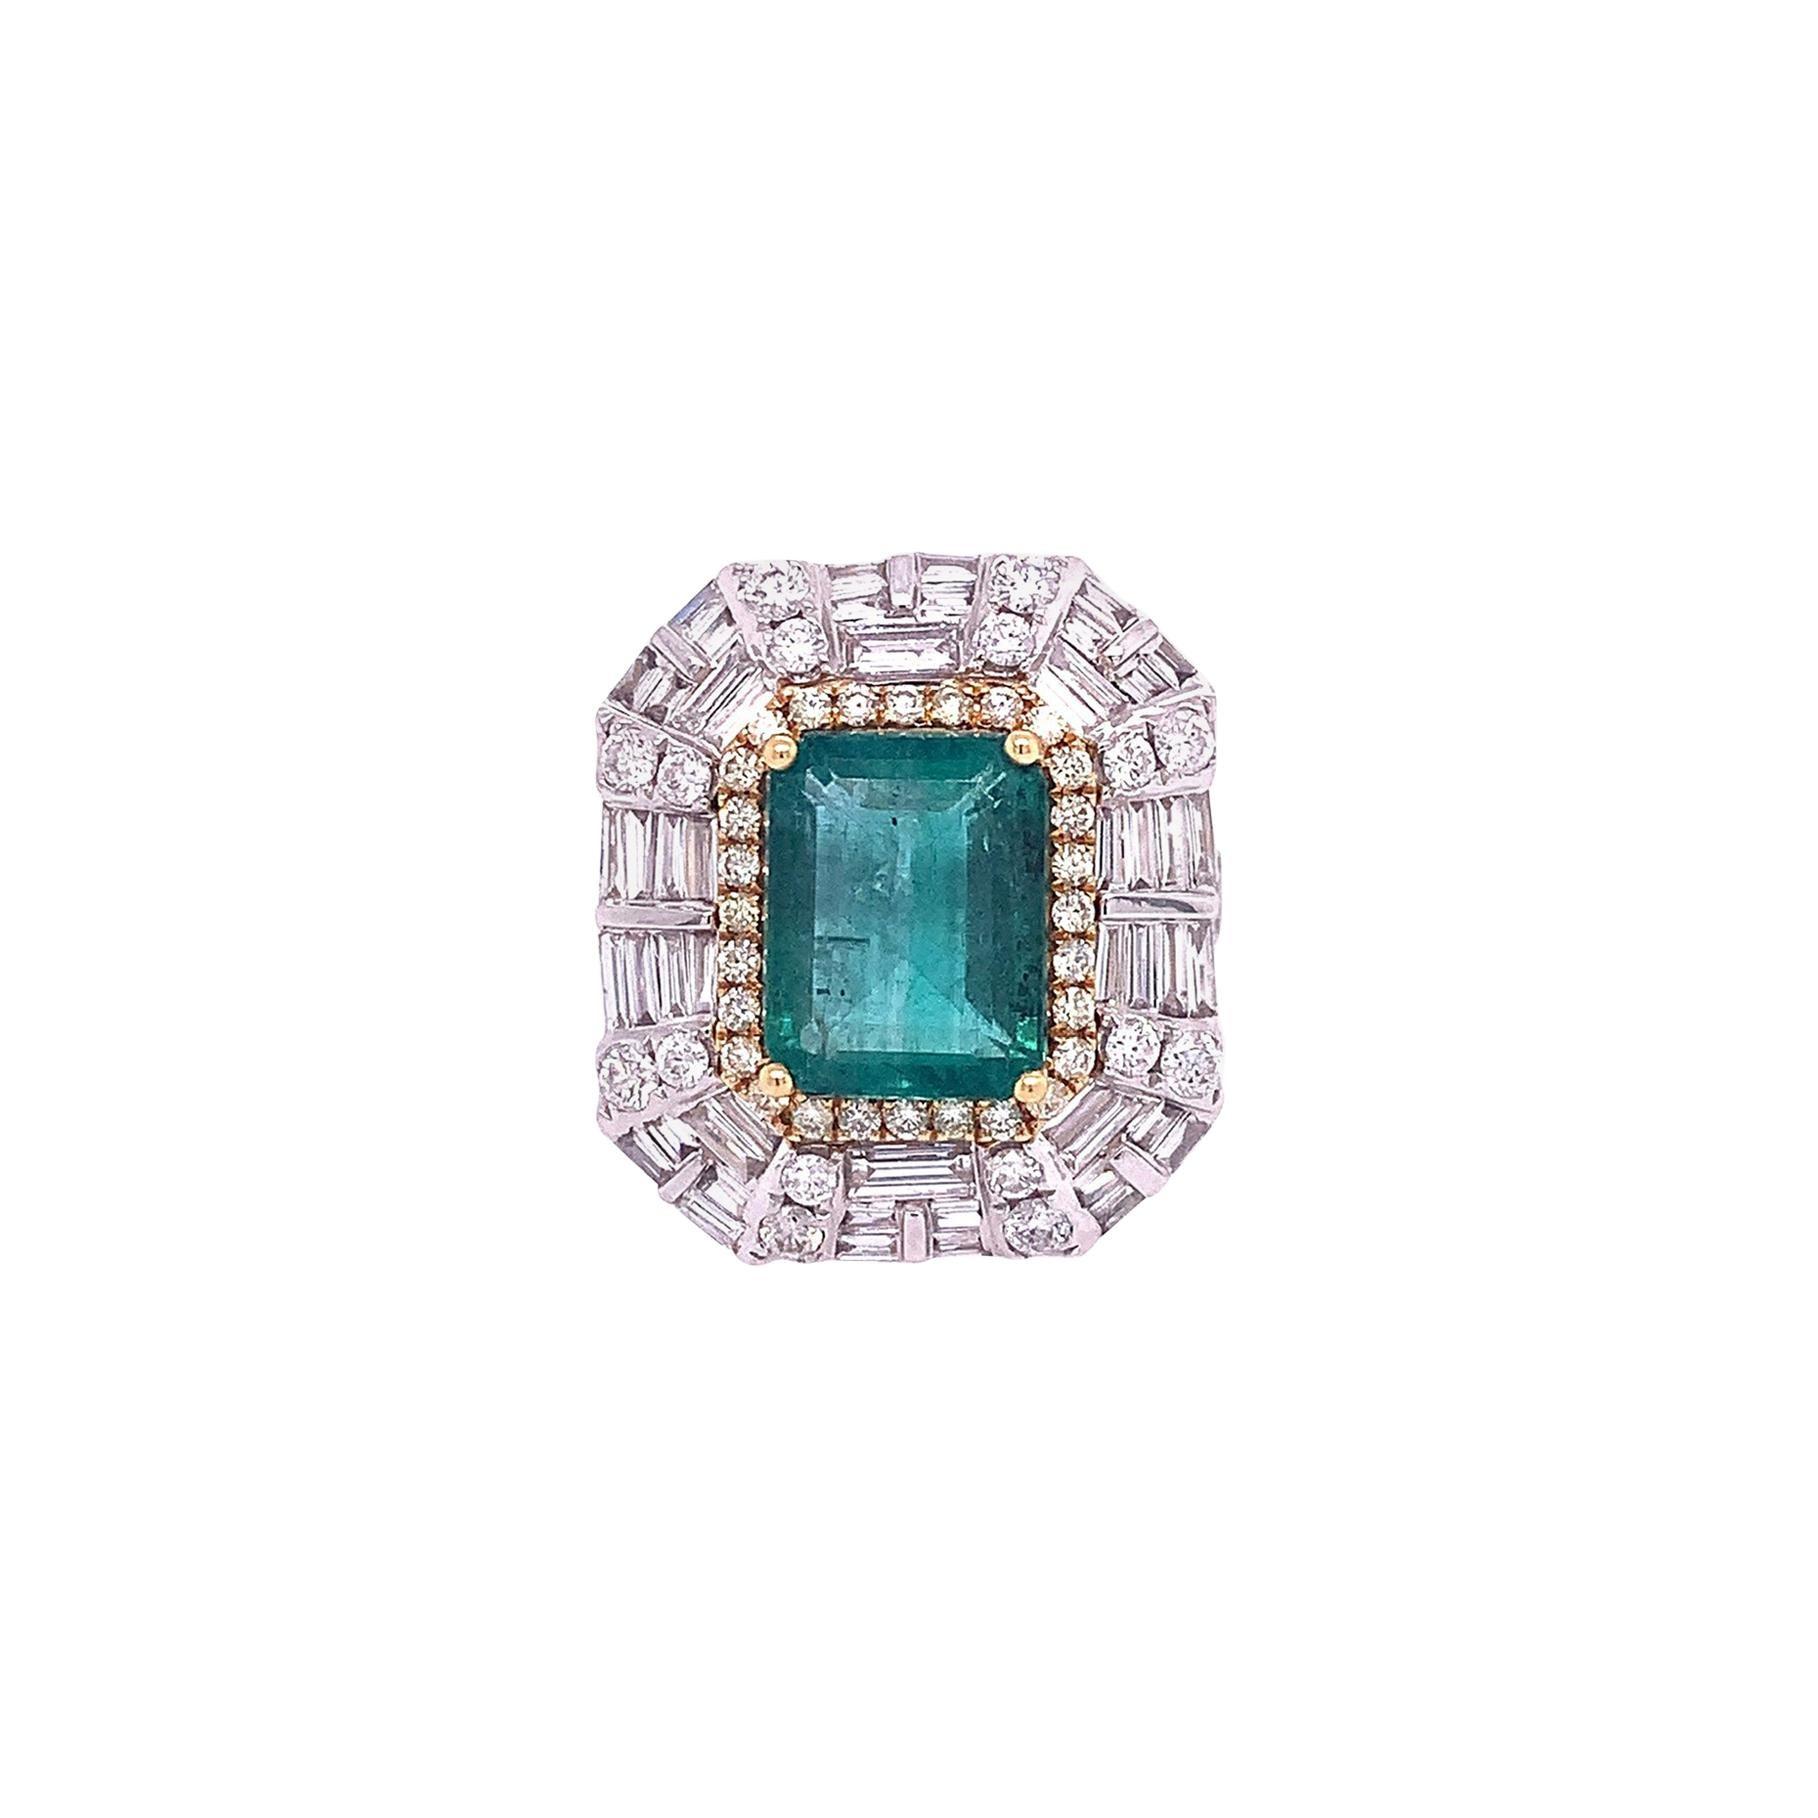 Ruchi New York Emerald and Diamond Cocktail Ring